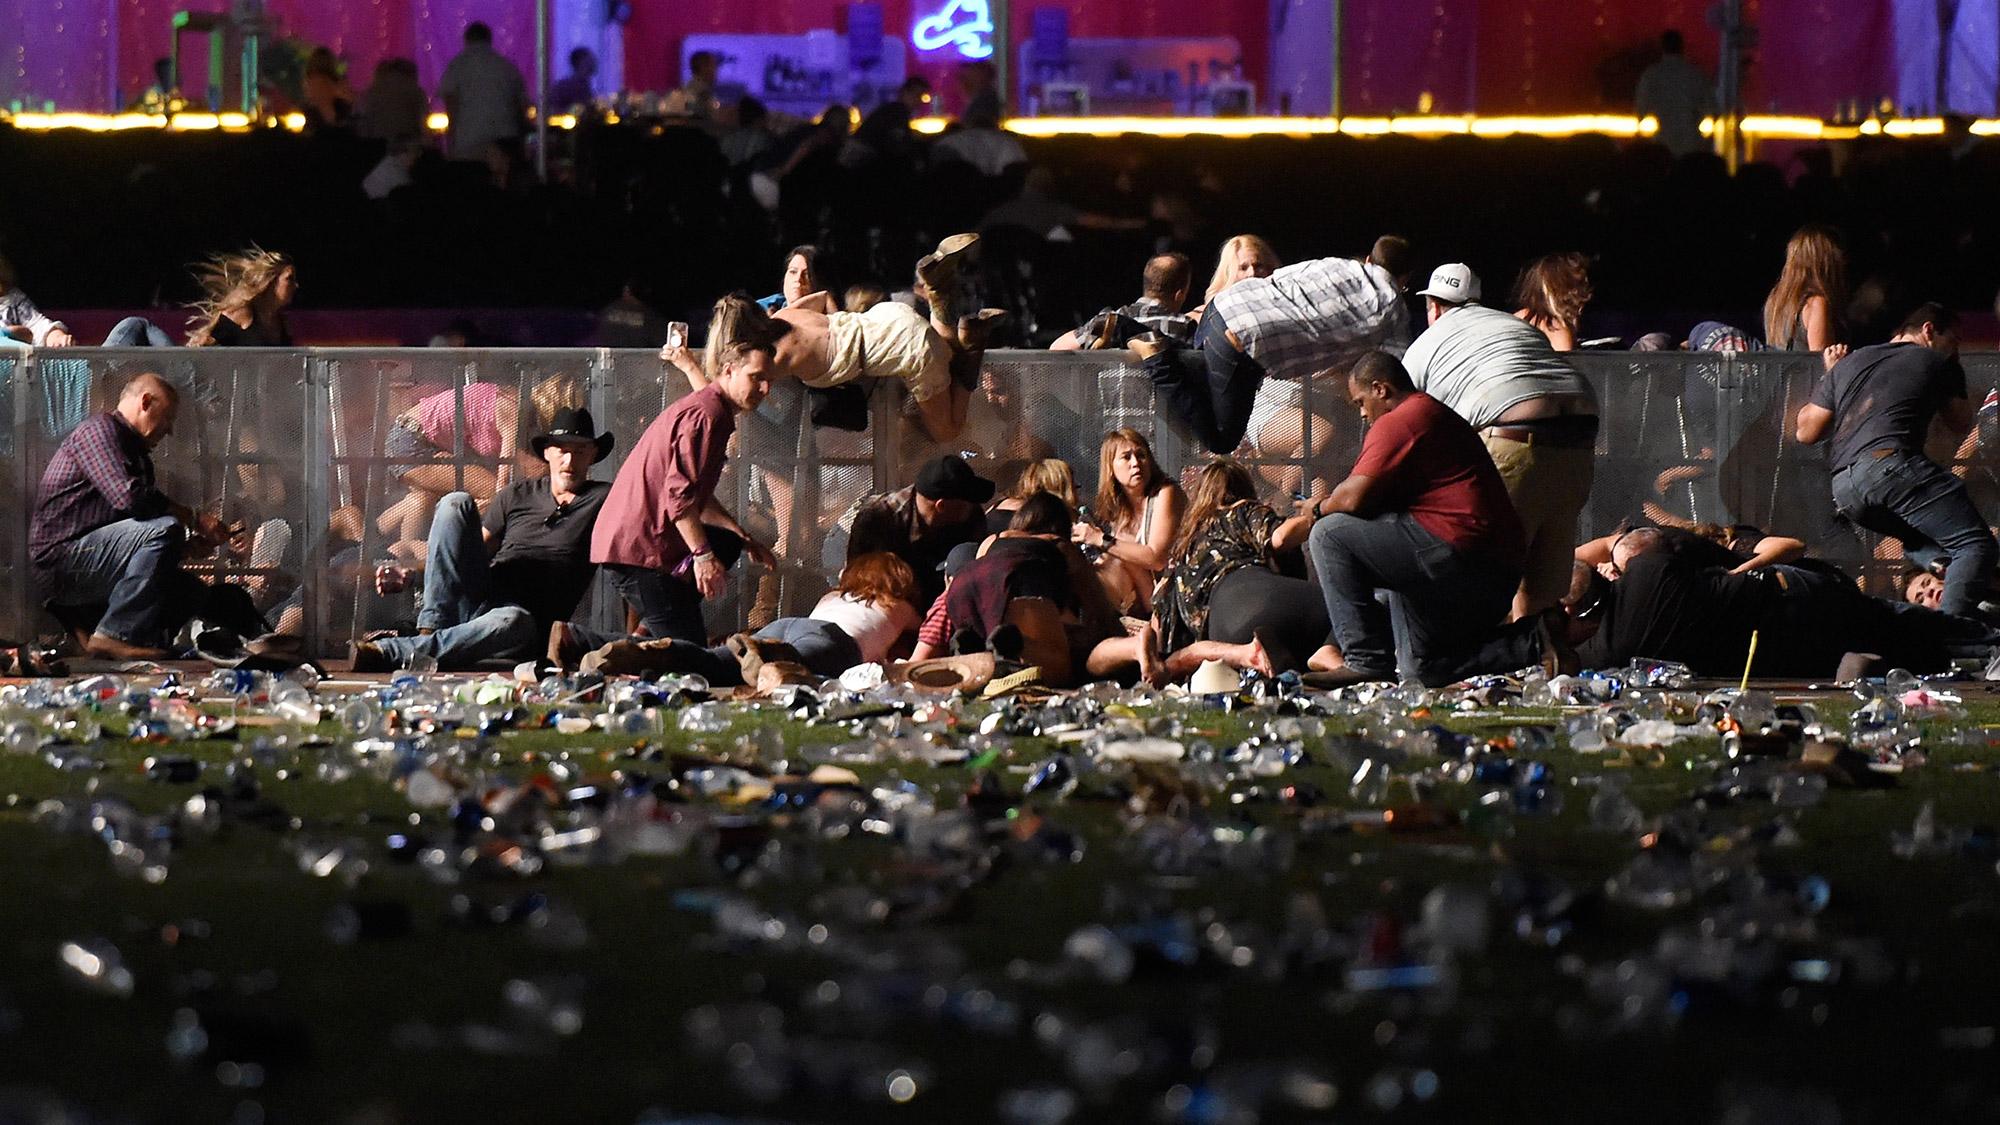 casino video of las vegas shooter